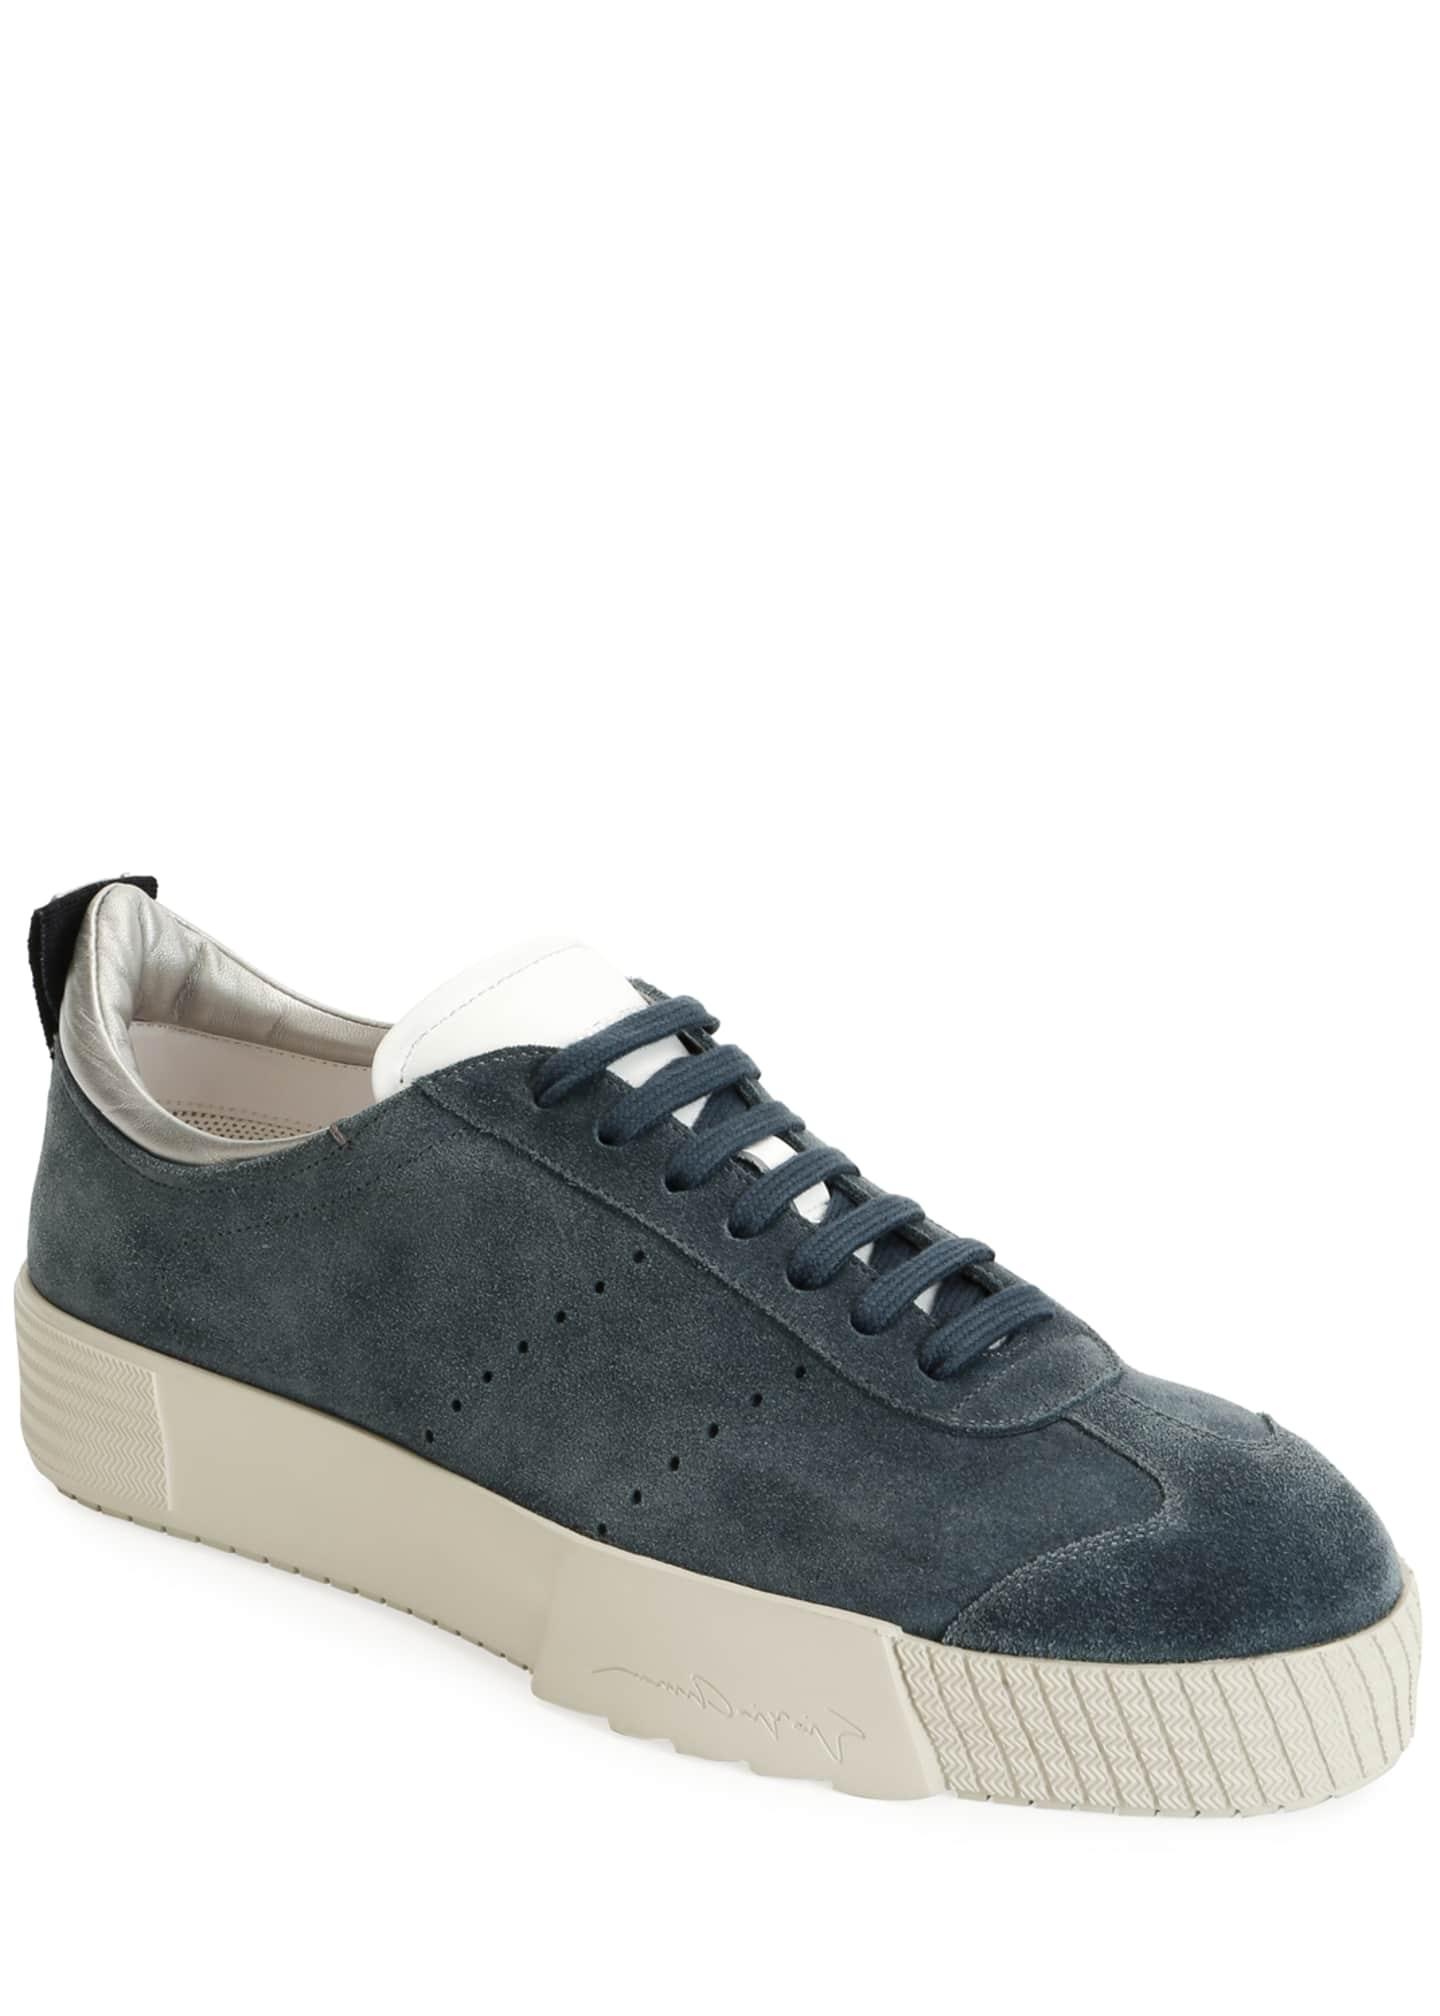 Giorgio Armani Men's Suede Low-Top Sneakers, Blue